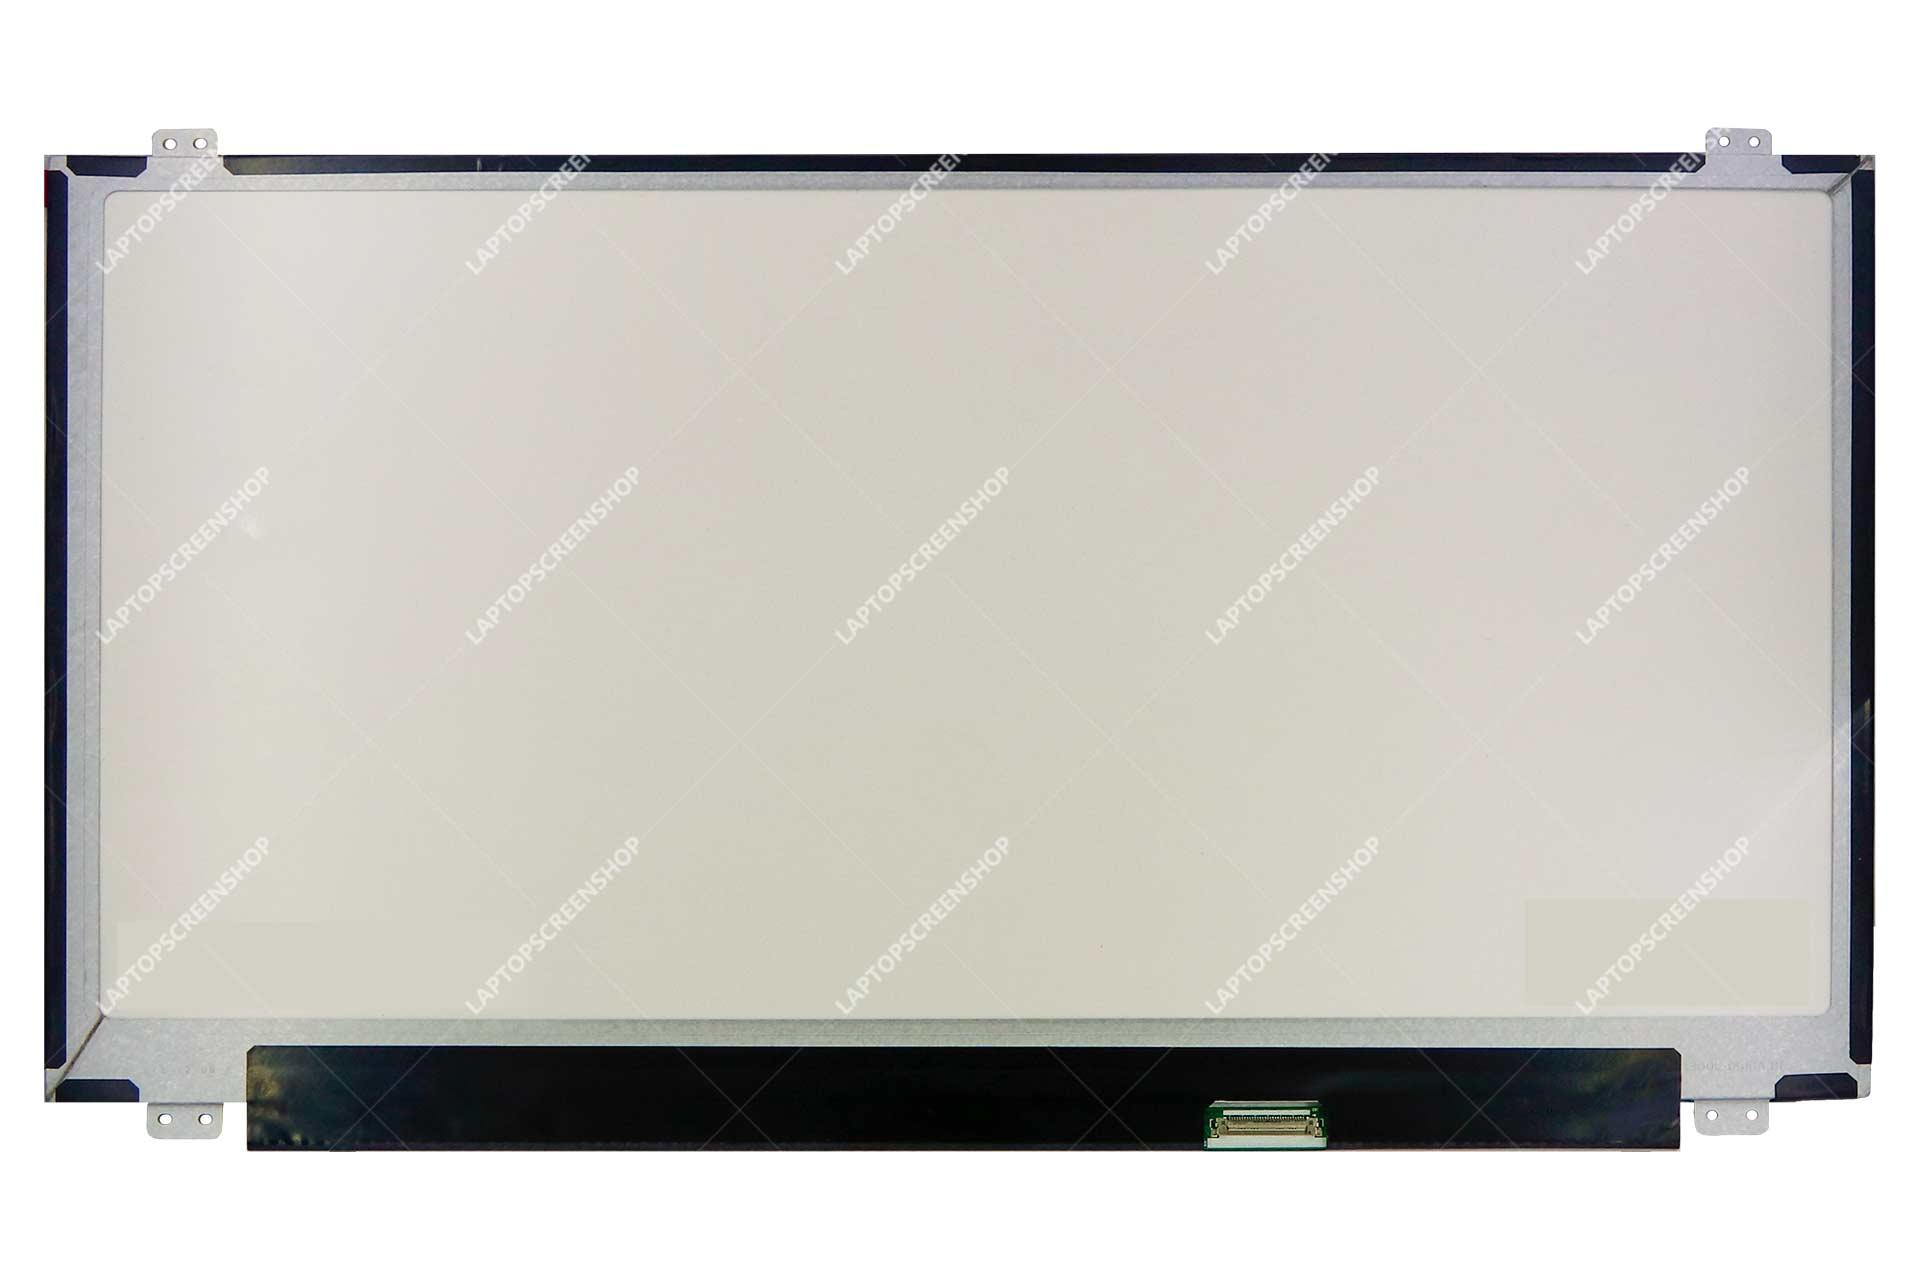 ACER-ASPIRE-E1-422-3481-LCD-LCD |HD|فروشگاه لپ تاپ اسکرين | تعمير لپ تاپ